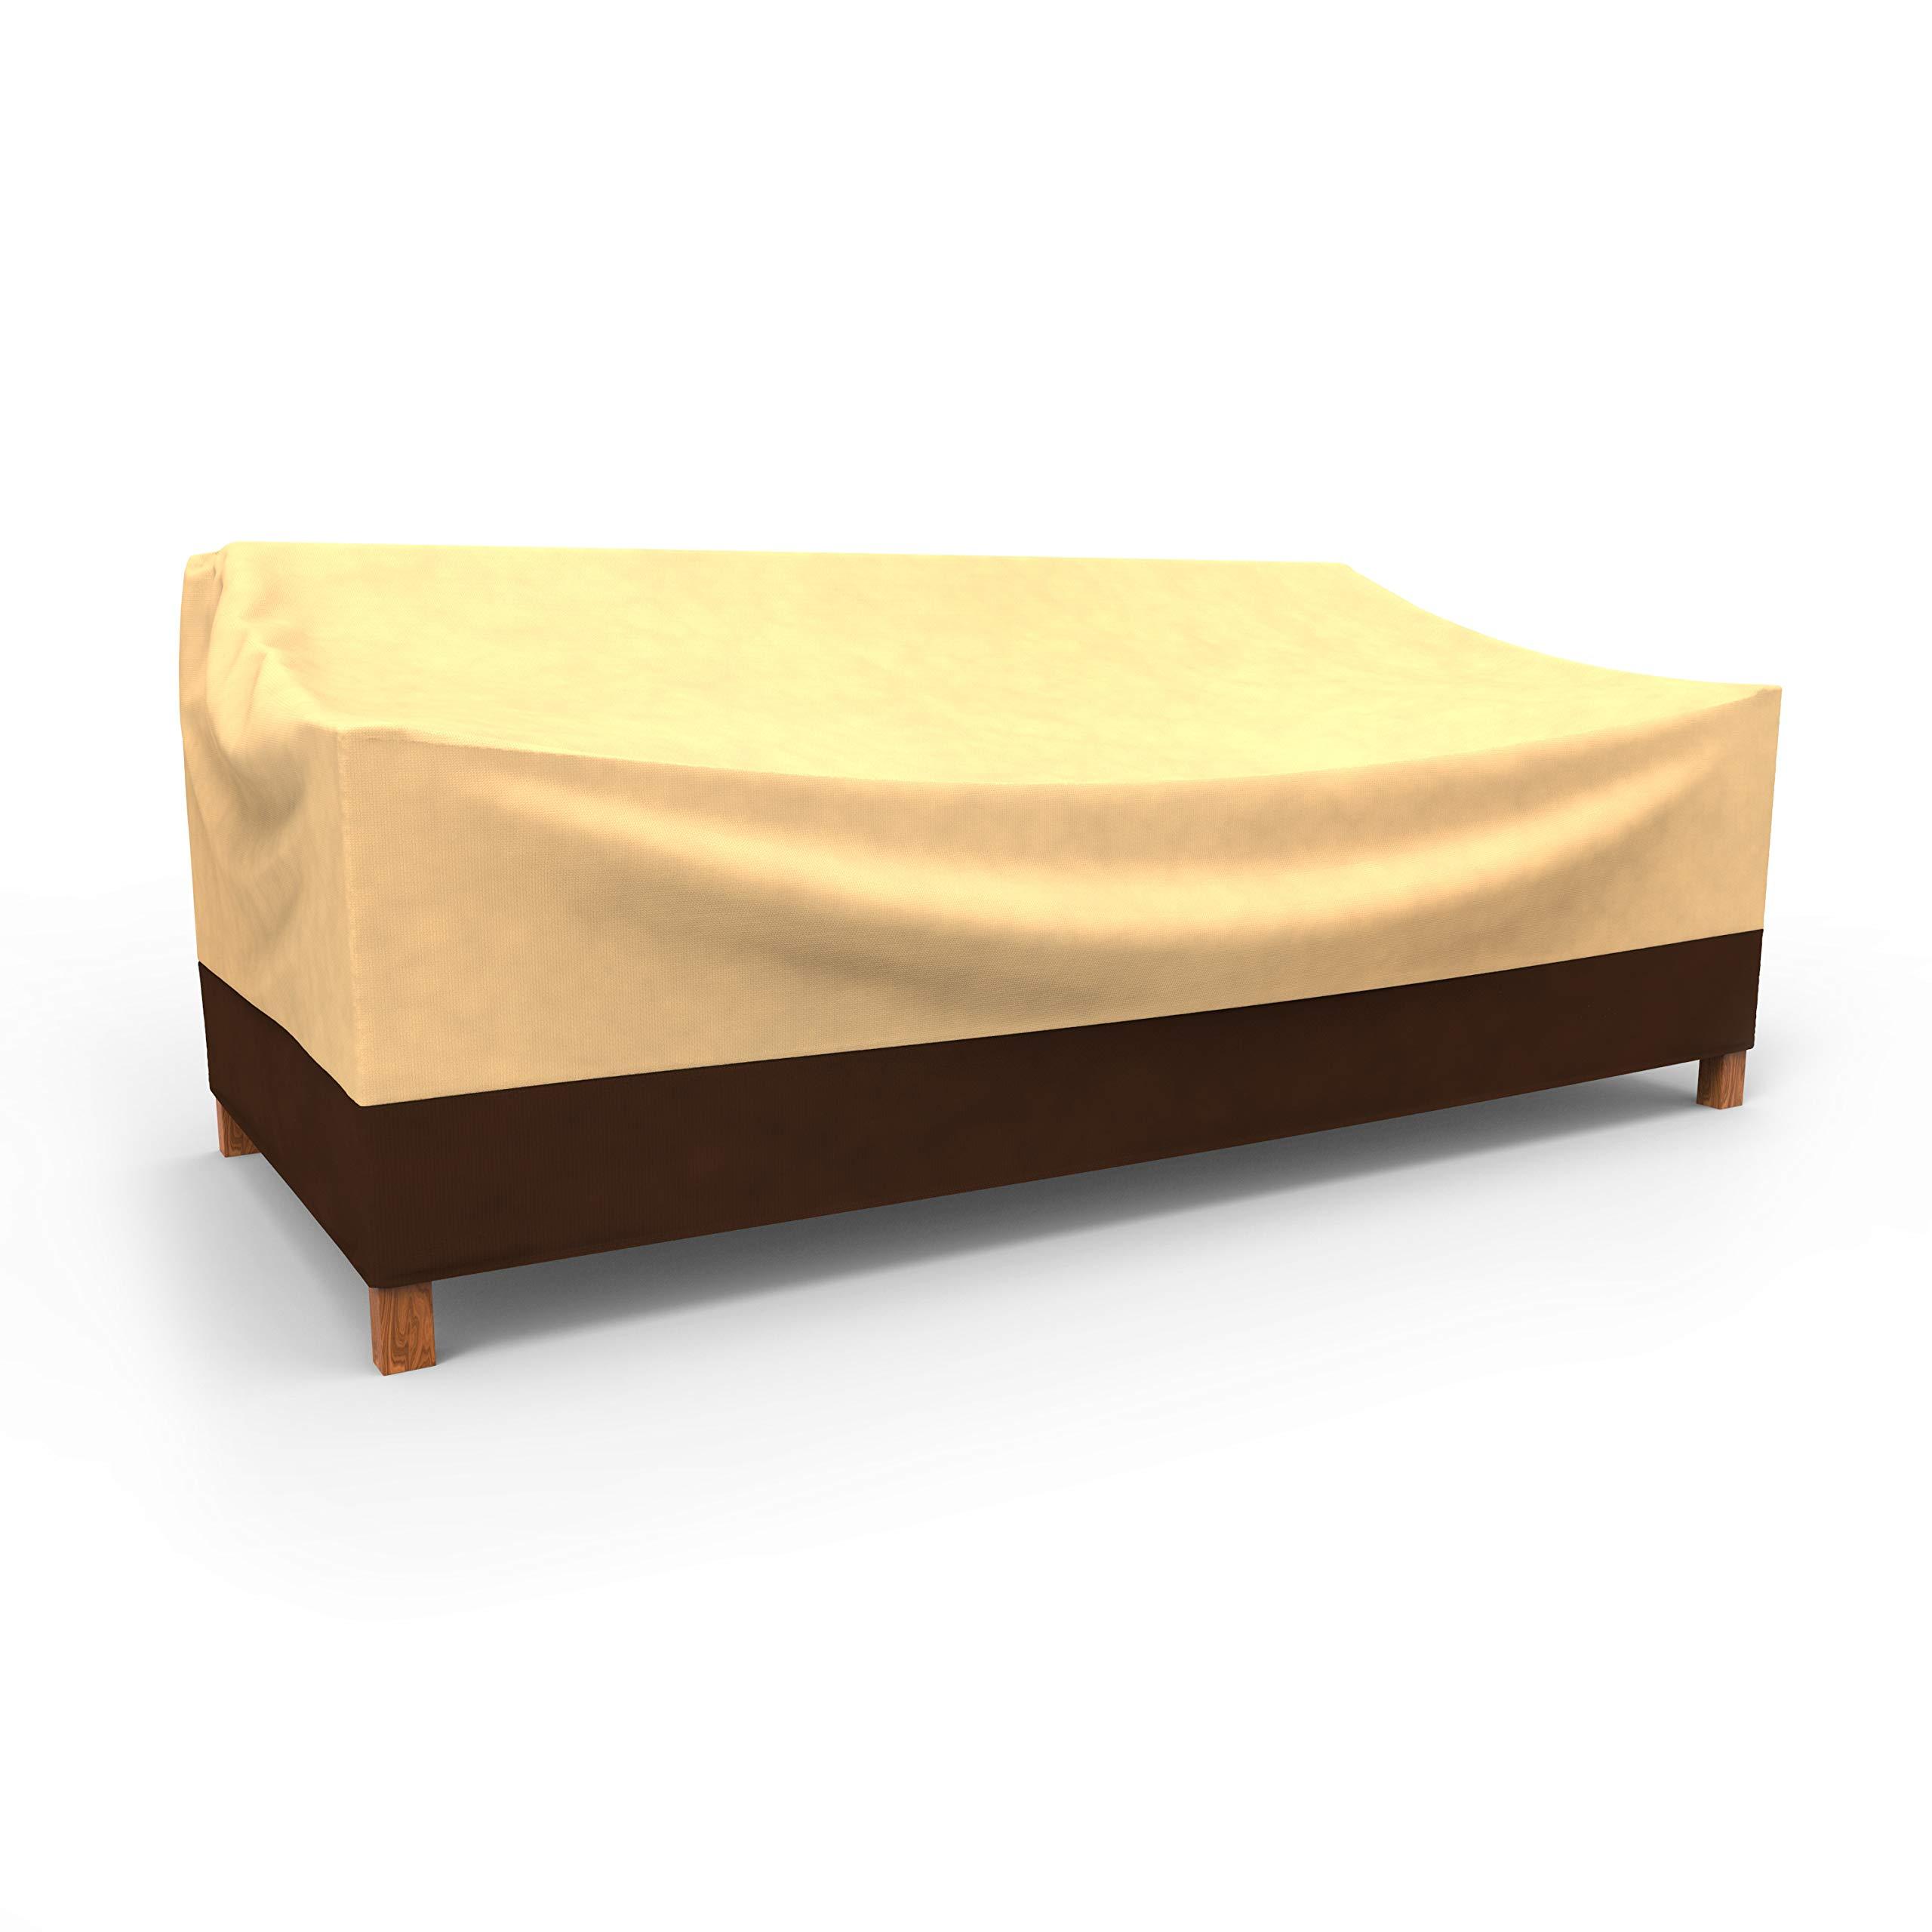 EmpirePatio Classic Outdoor Sofa Cover Extra Extra Large - Khaki Brown